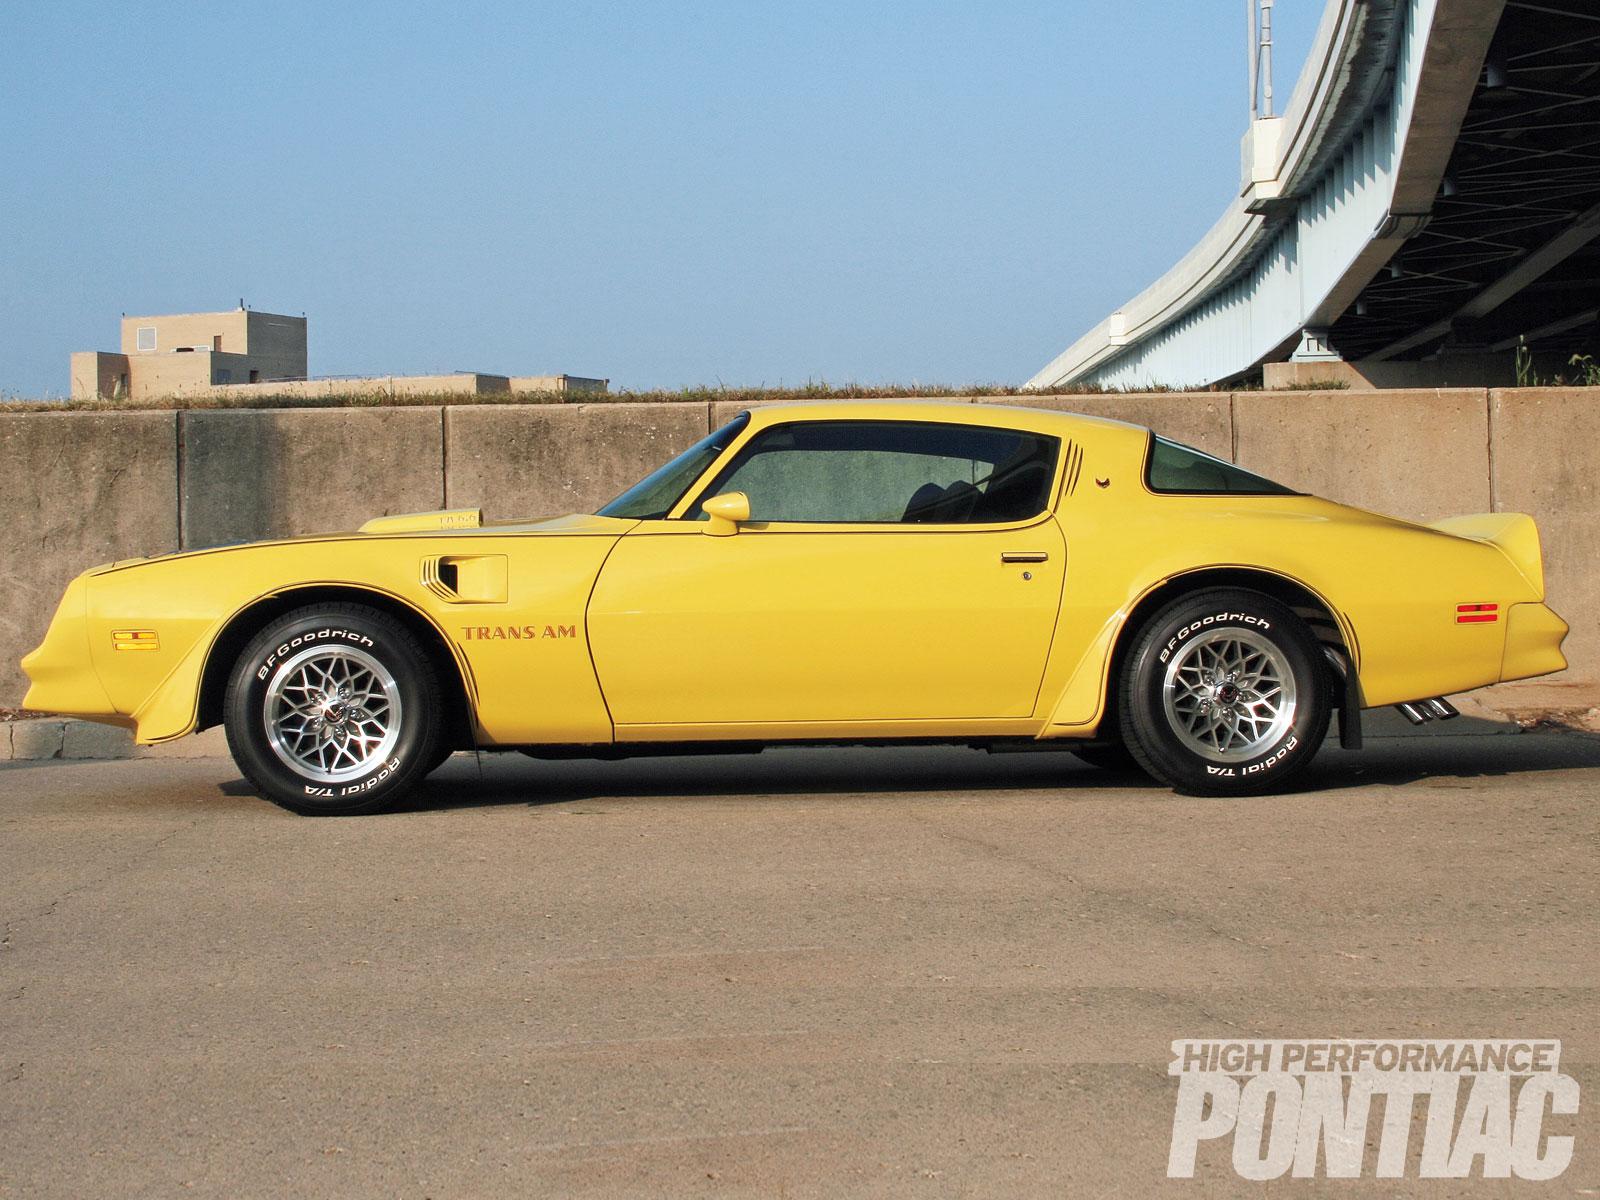 1977 Pontiac Trans Am By Pinkees Rod Shop 1600x1200